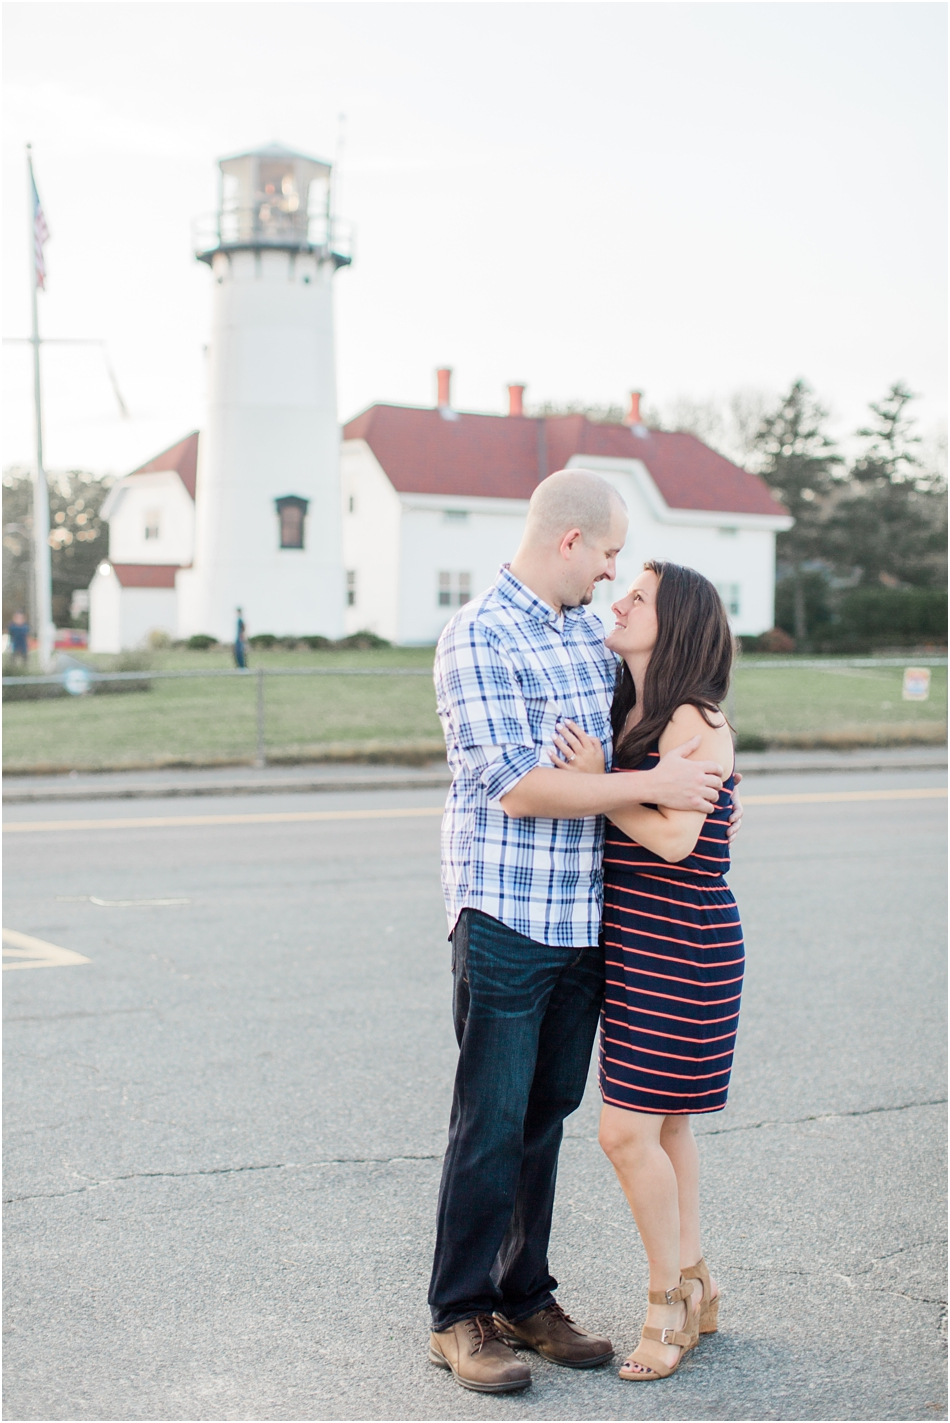 chatham_engagement_danielle_luke_cape_cod_boston_new_england_wedding_photographer_Meredith_Jane_Photography_photo_2622.jpg